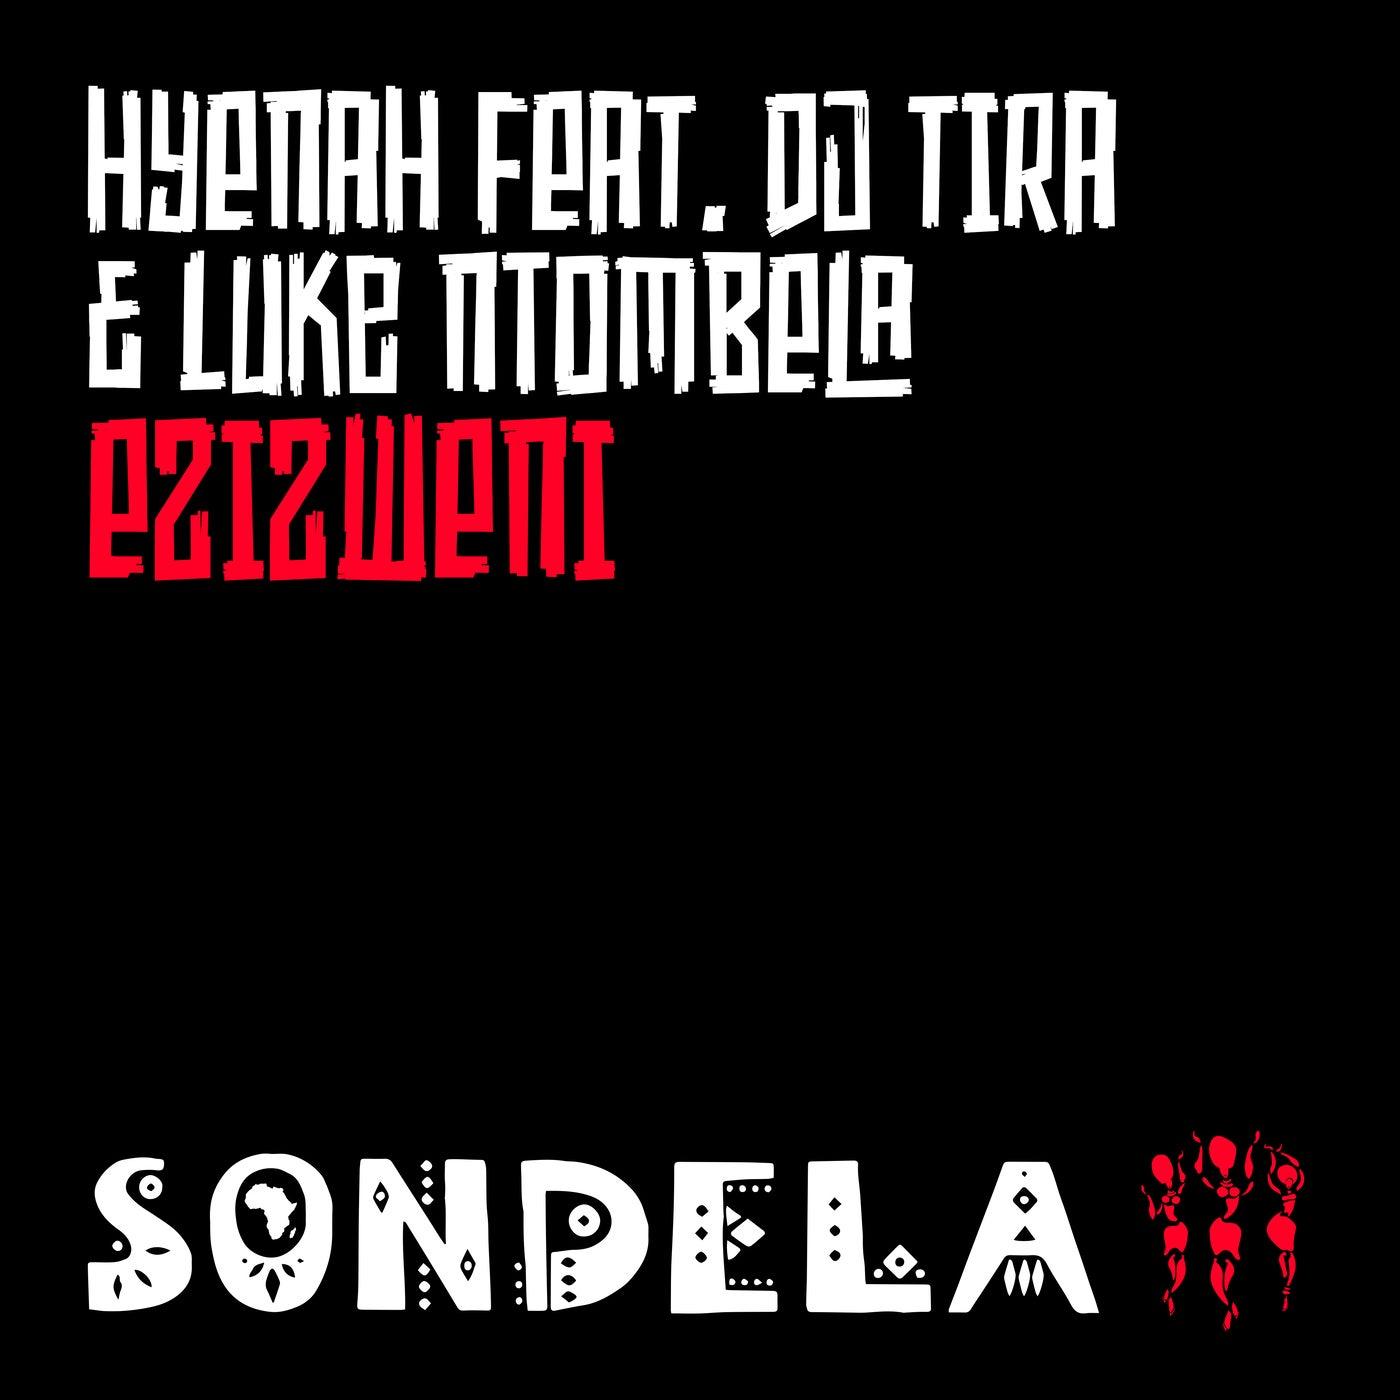 Ezizweni feat. DJ Tira feat. Luke Ntombela (Extended Mix)